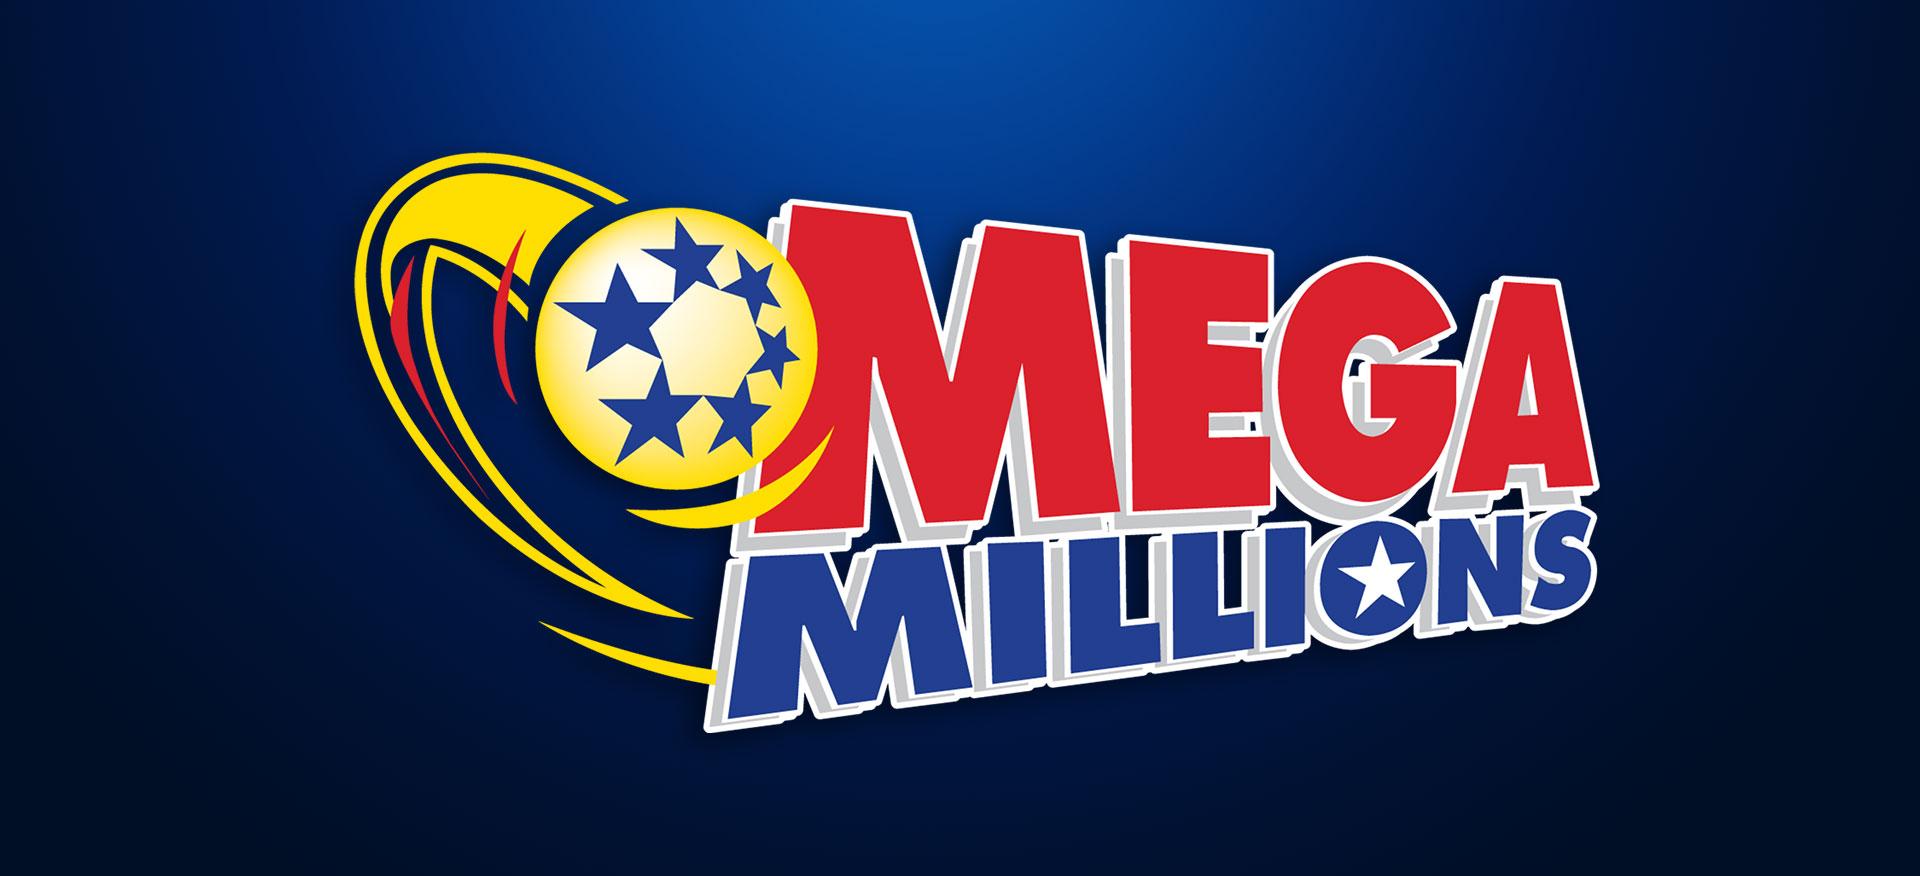 mega millions - photo #15